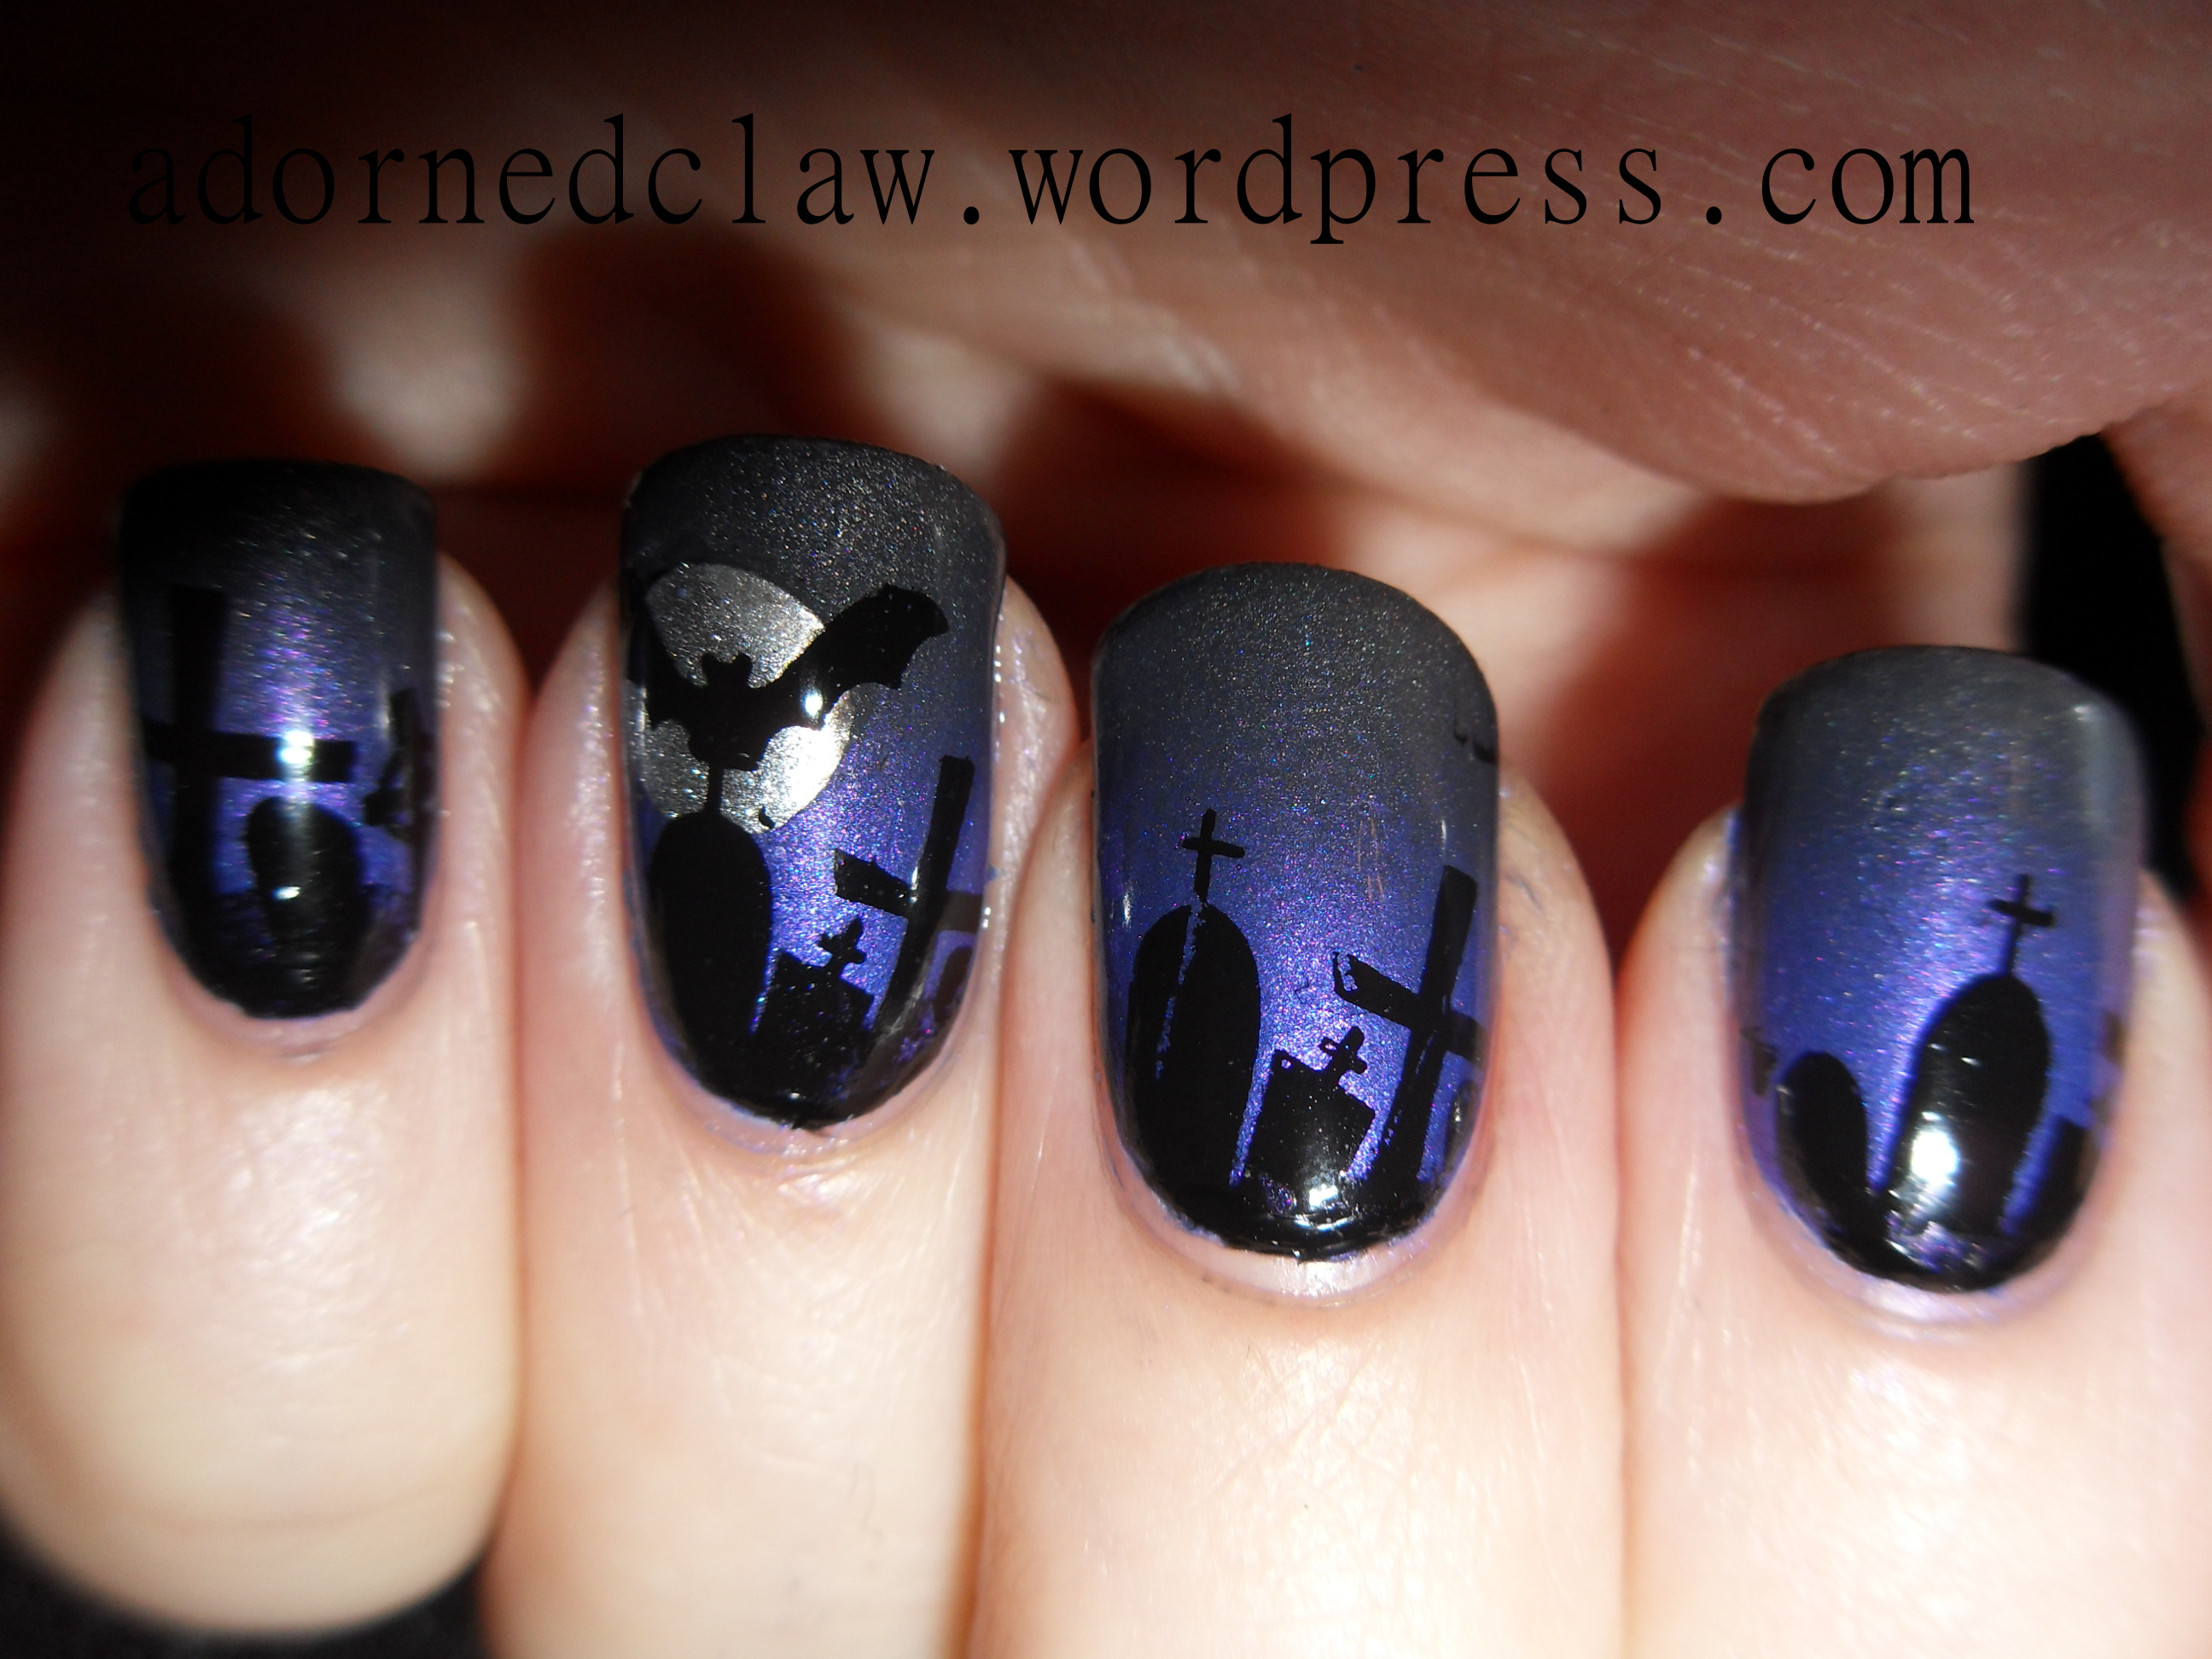 Halloween nail art the adorned claw - Nail art halloween ...